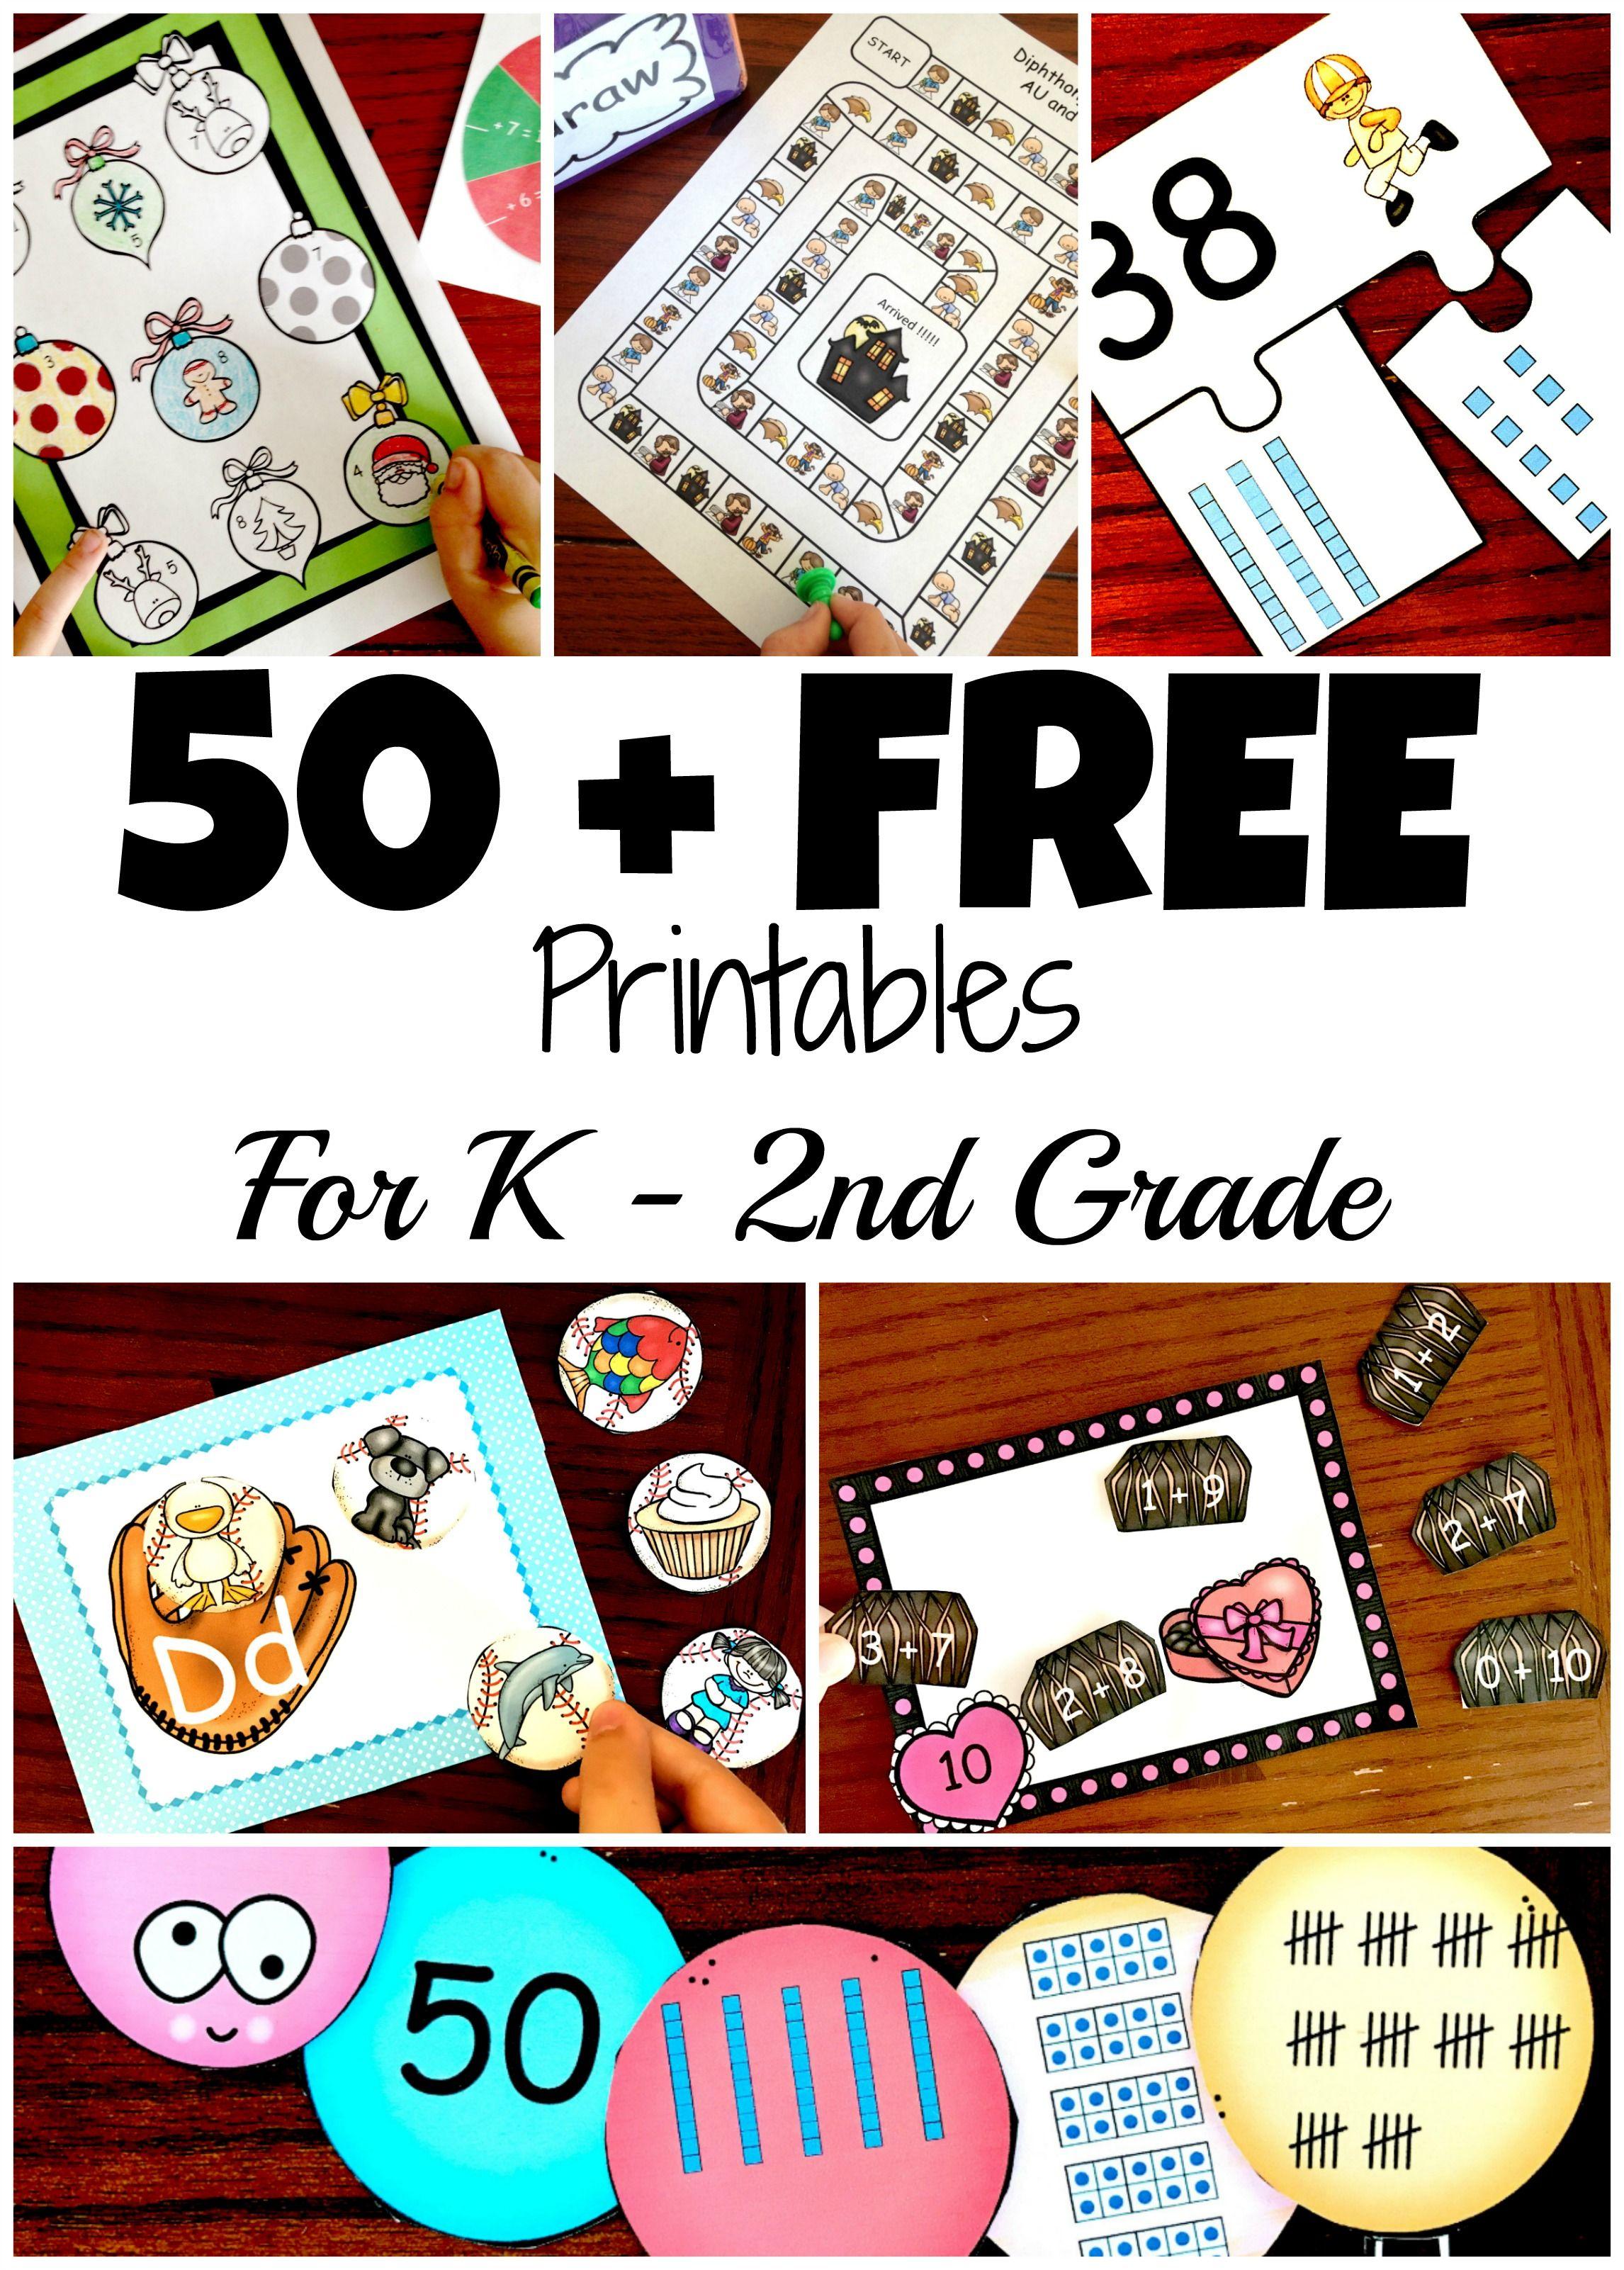 Free Printables For K